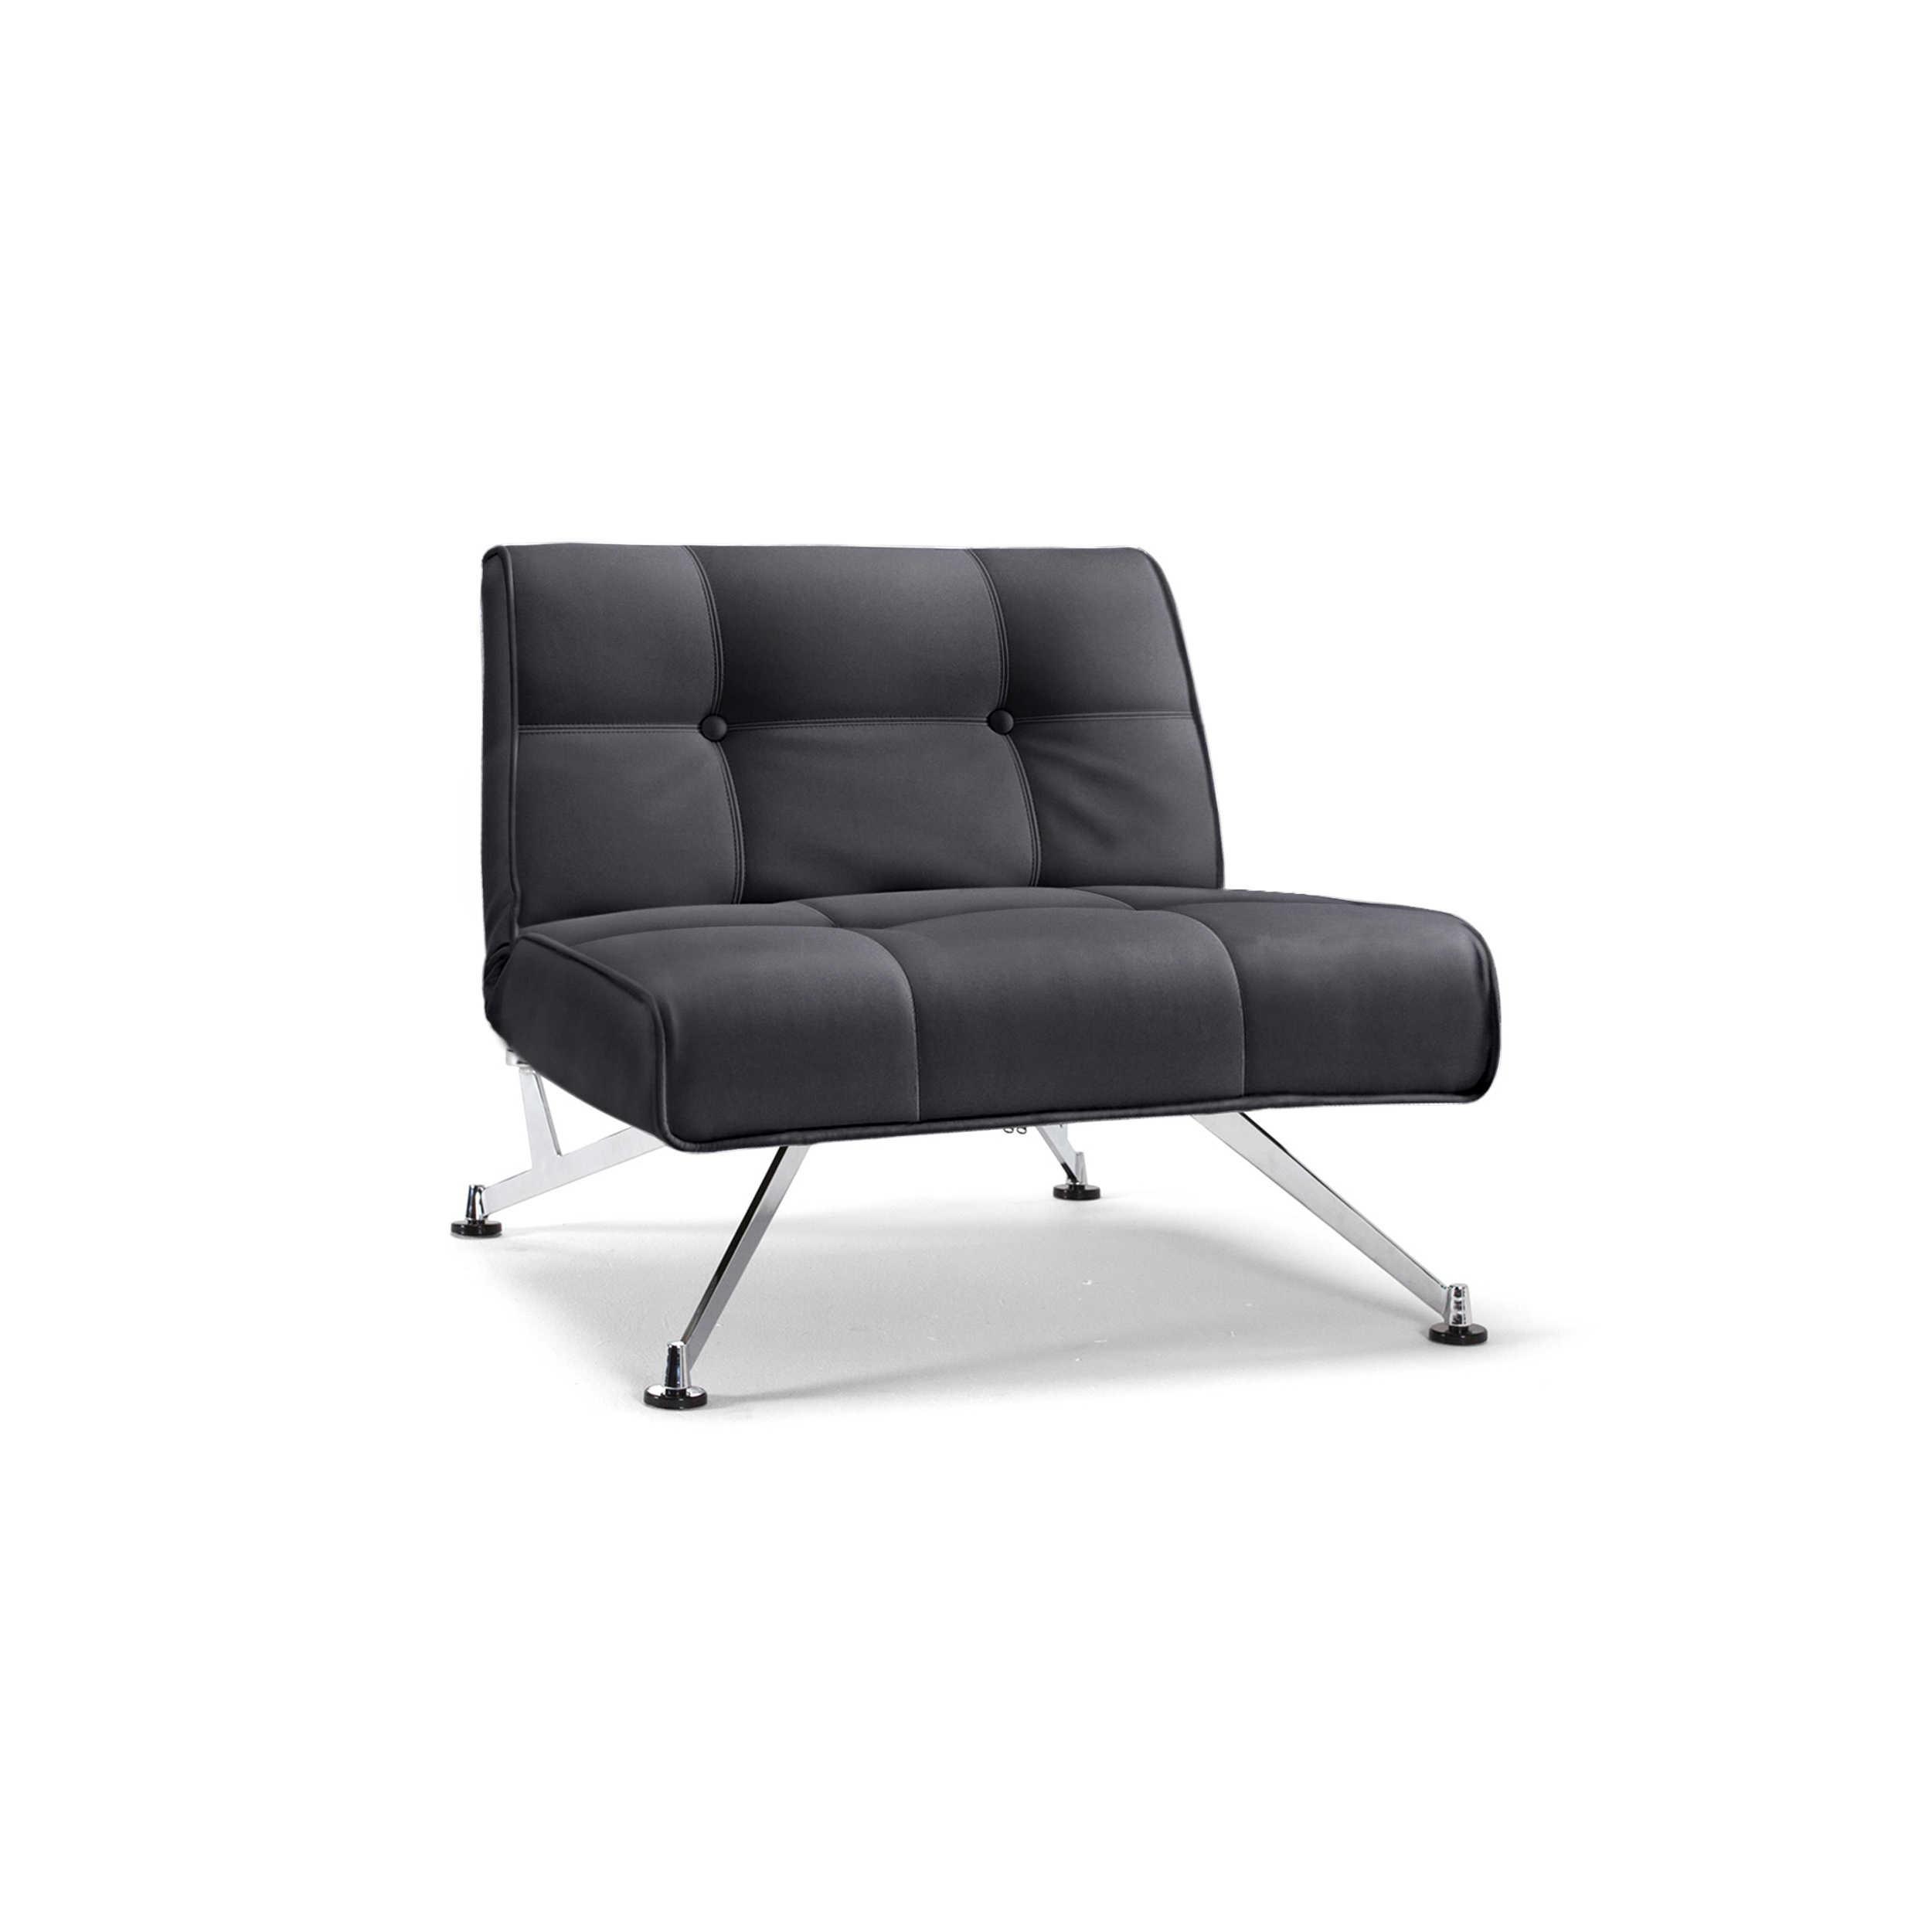 innovation sessel clubber schwarz lederoptik online kaufen bei woonio. Black Bedroom Furniture Sets. Home Design Ideas